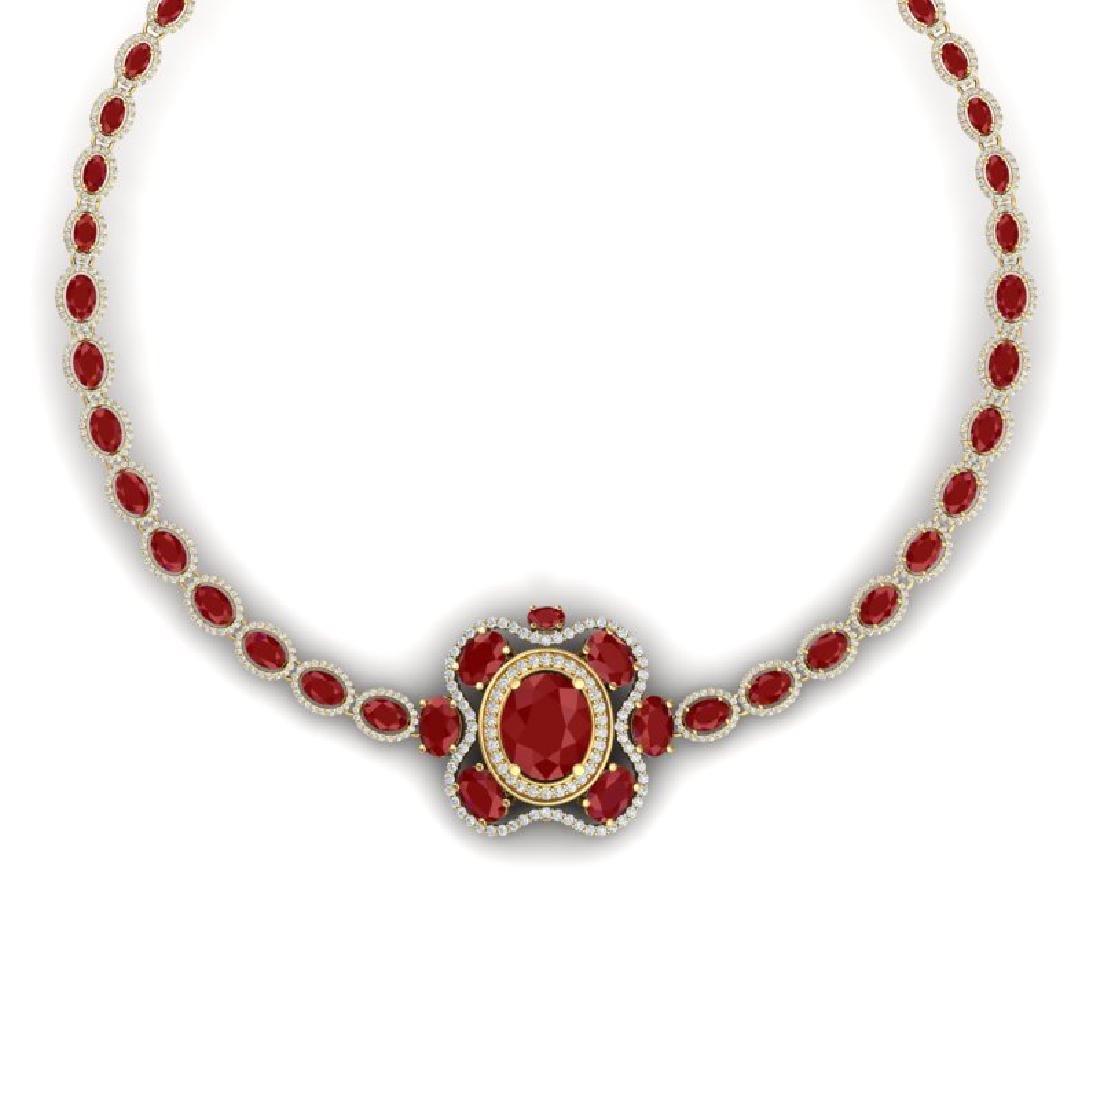 47.43 CTW Royalty Ruby & VS Diamond Necklace 18K Yellow - 2